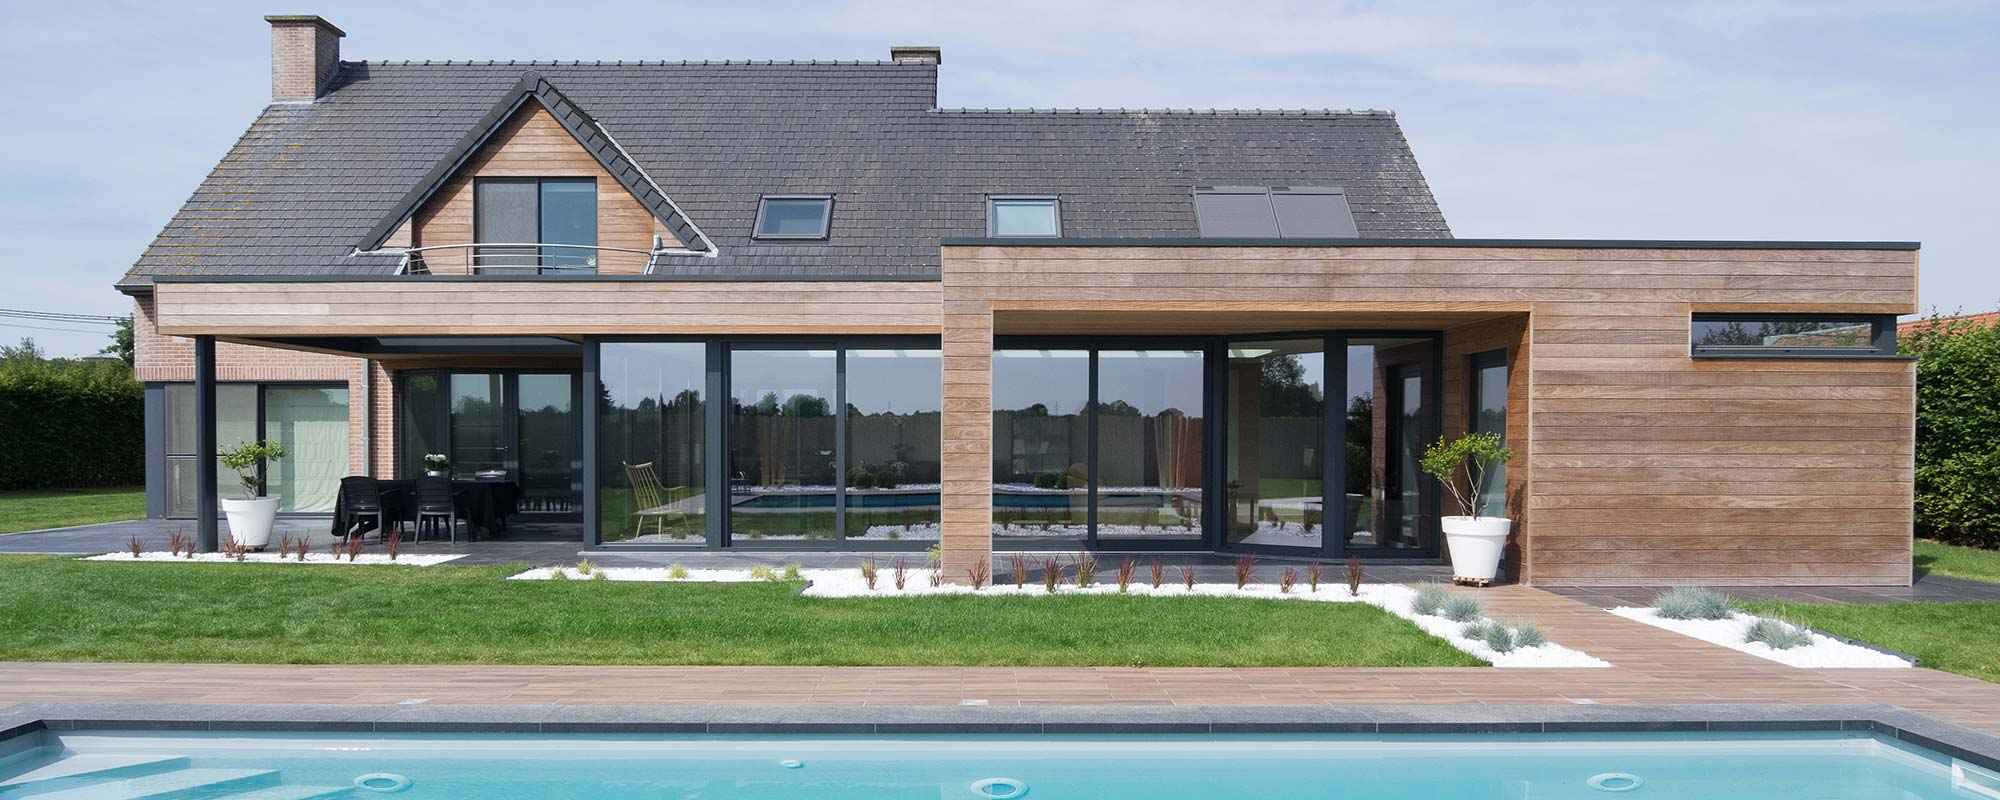 Nfvc fncv nl for Classic house nl